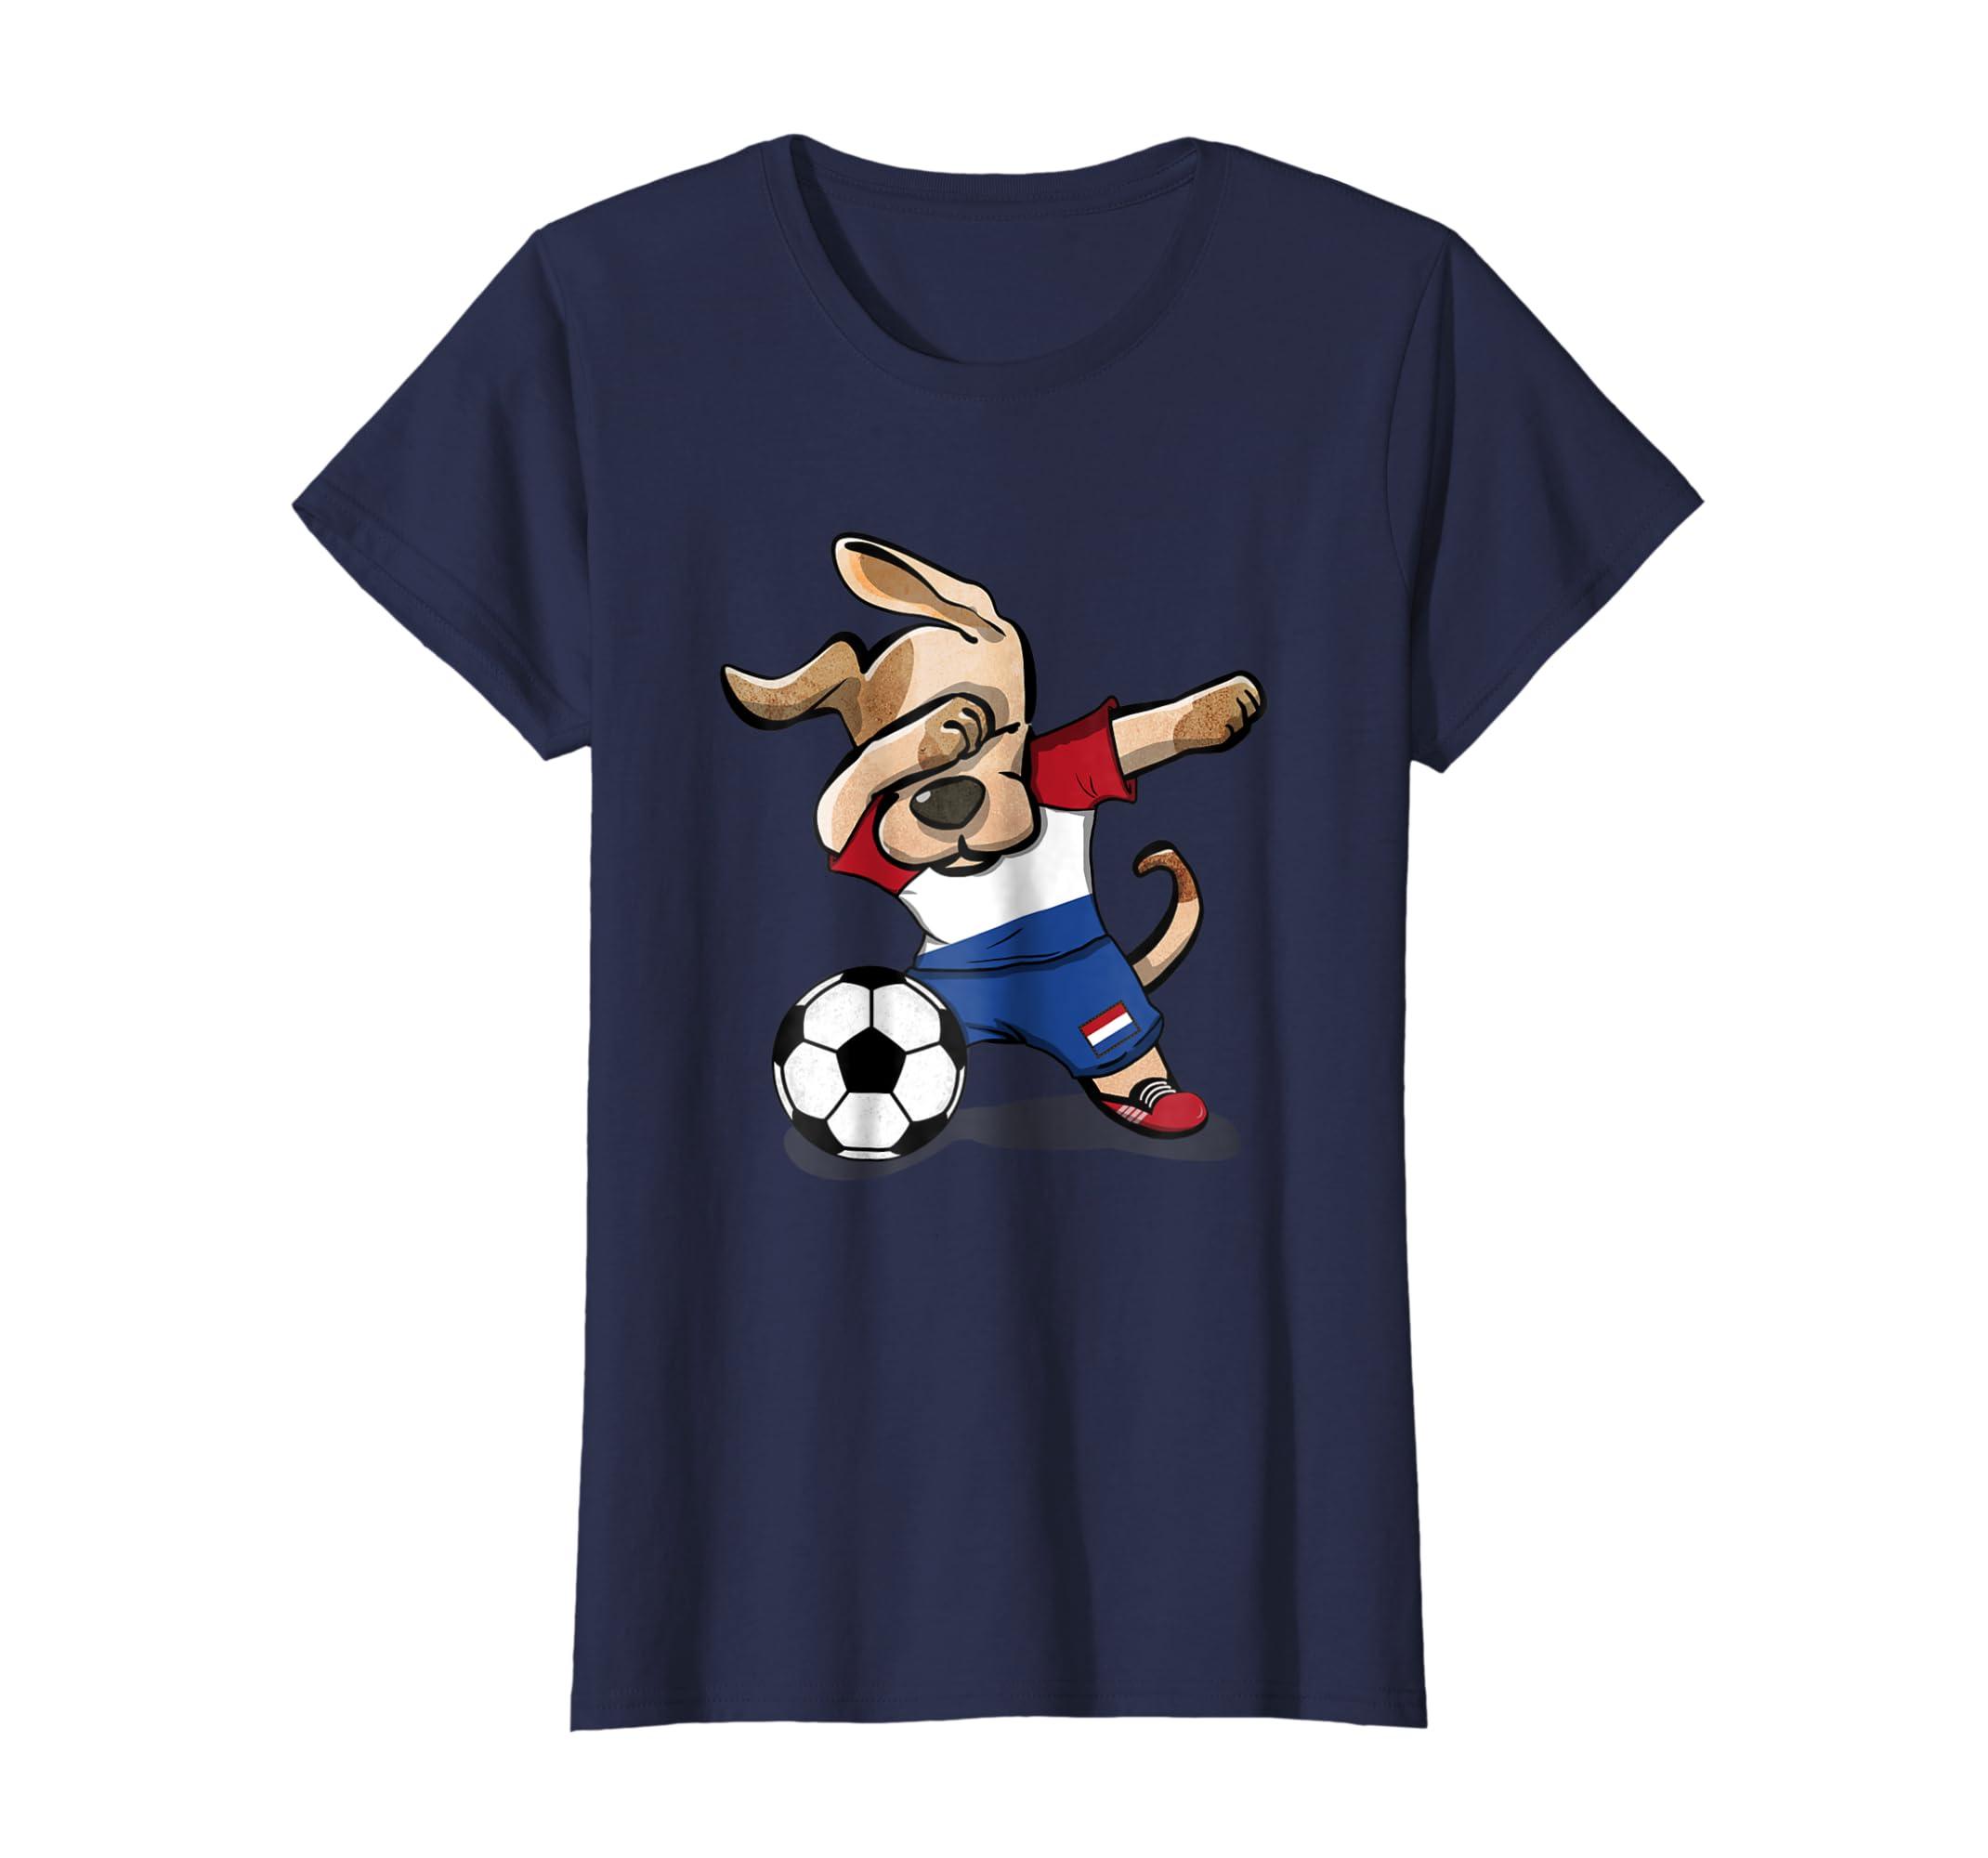 314284c24 Amazon.com  Dog Dabbing Soccer Netherlands Jersey Shirt Dutch Football   Clothing